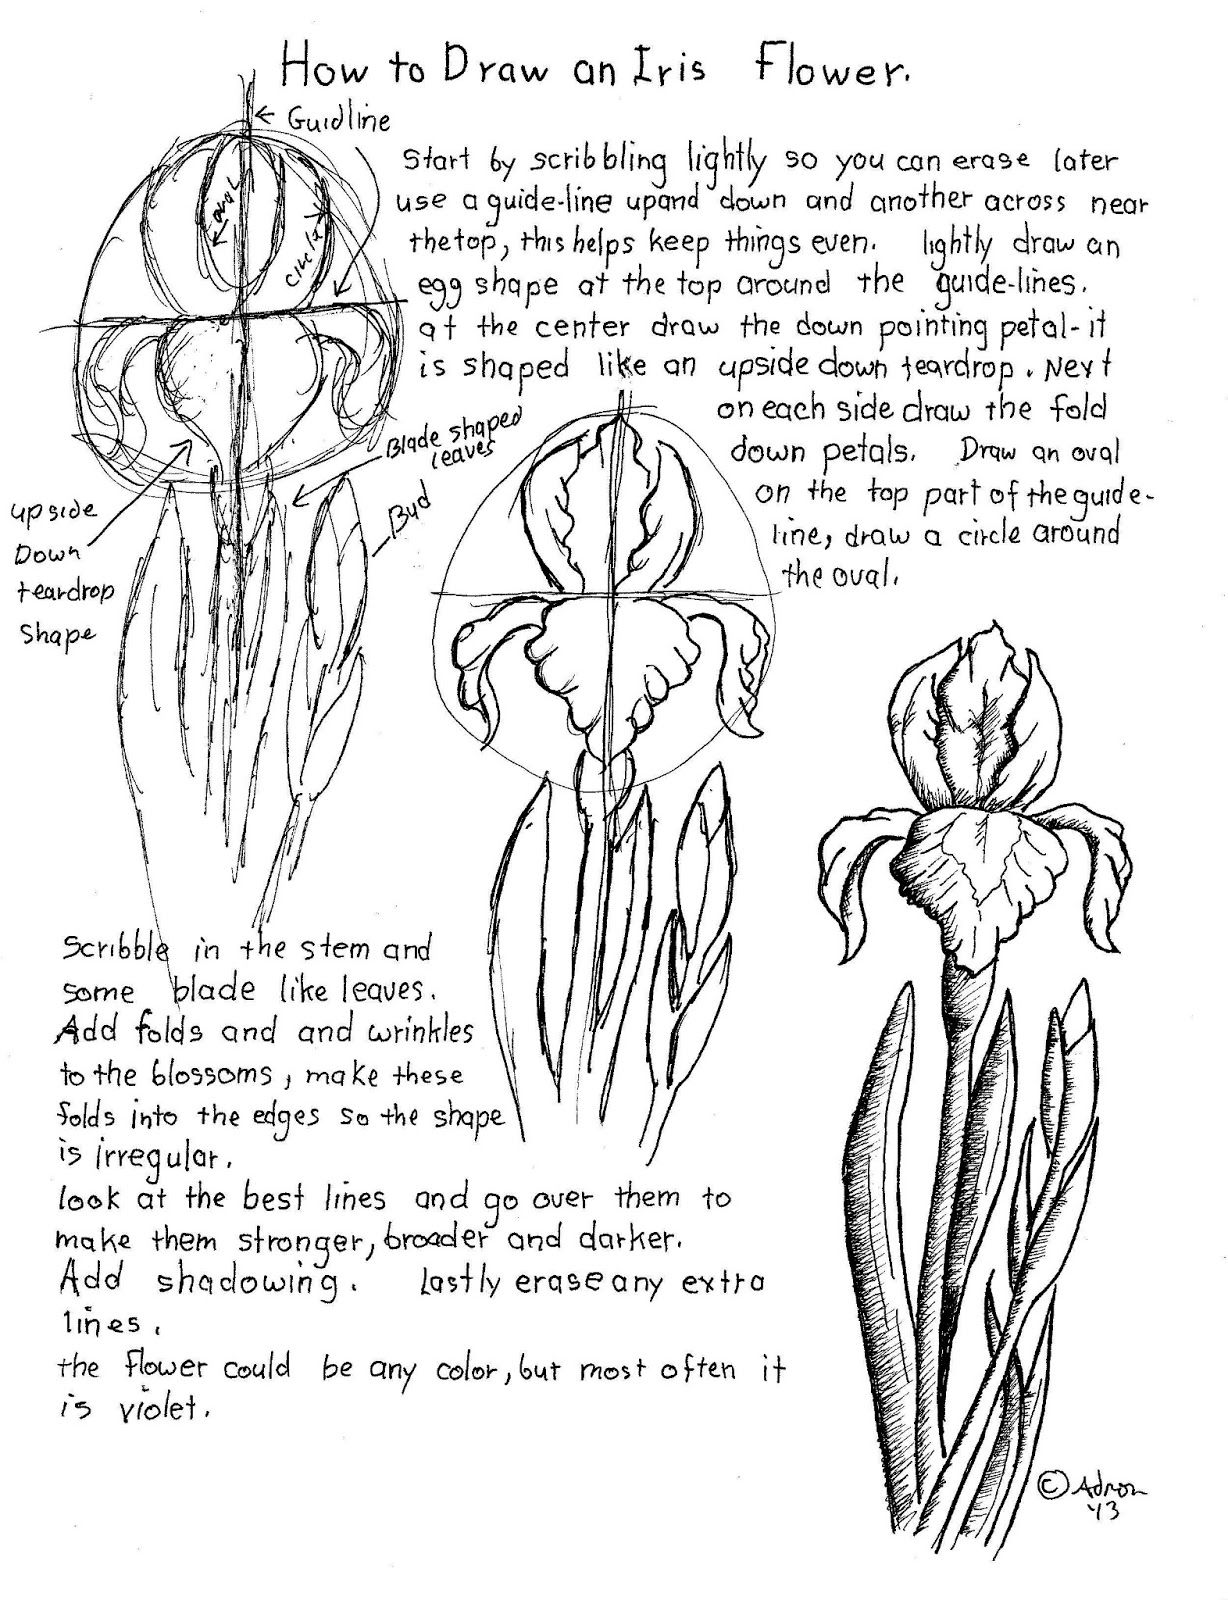 How To Draw An Iris Flower Worksheet